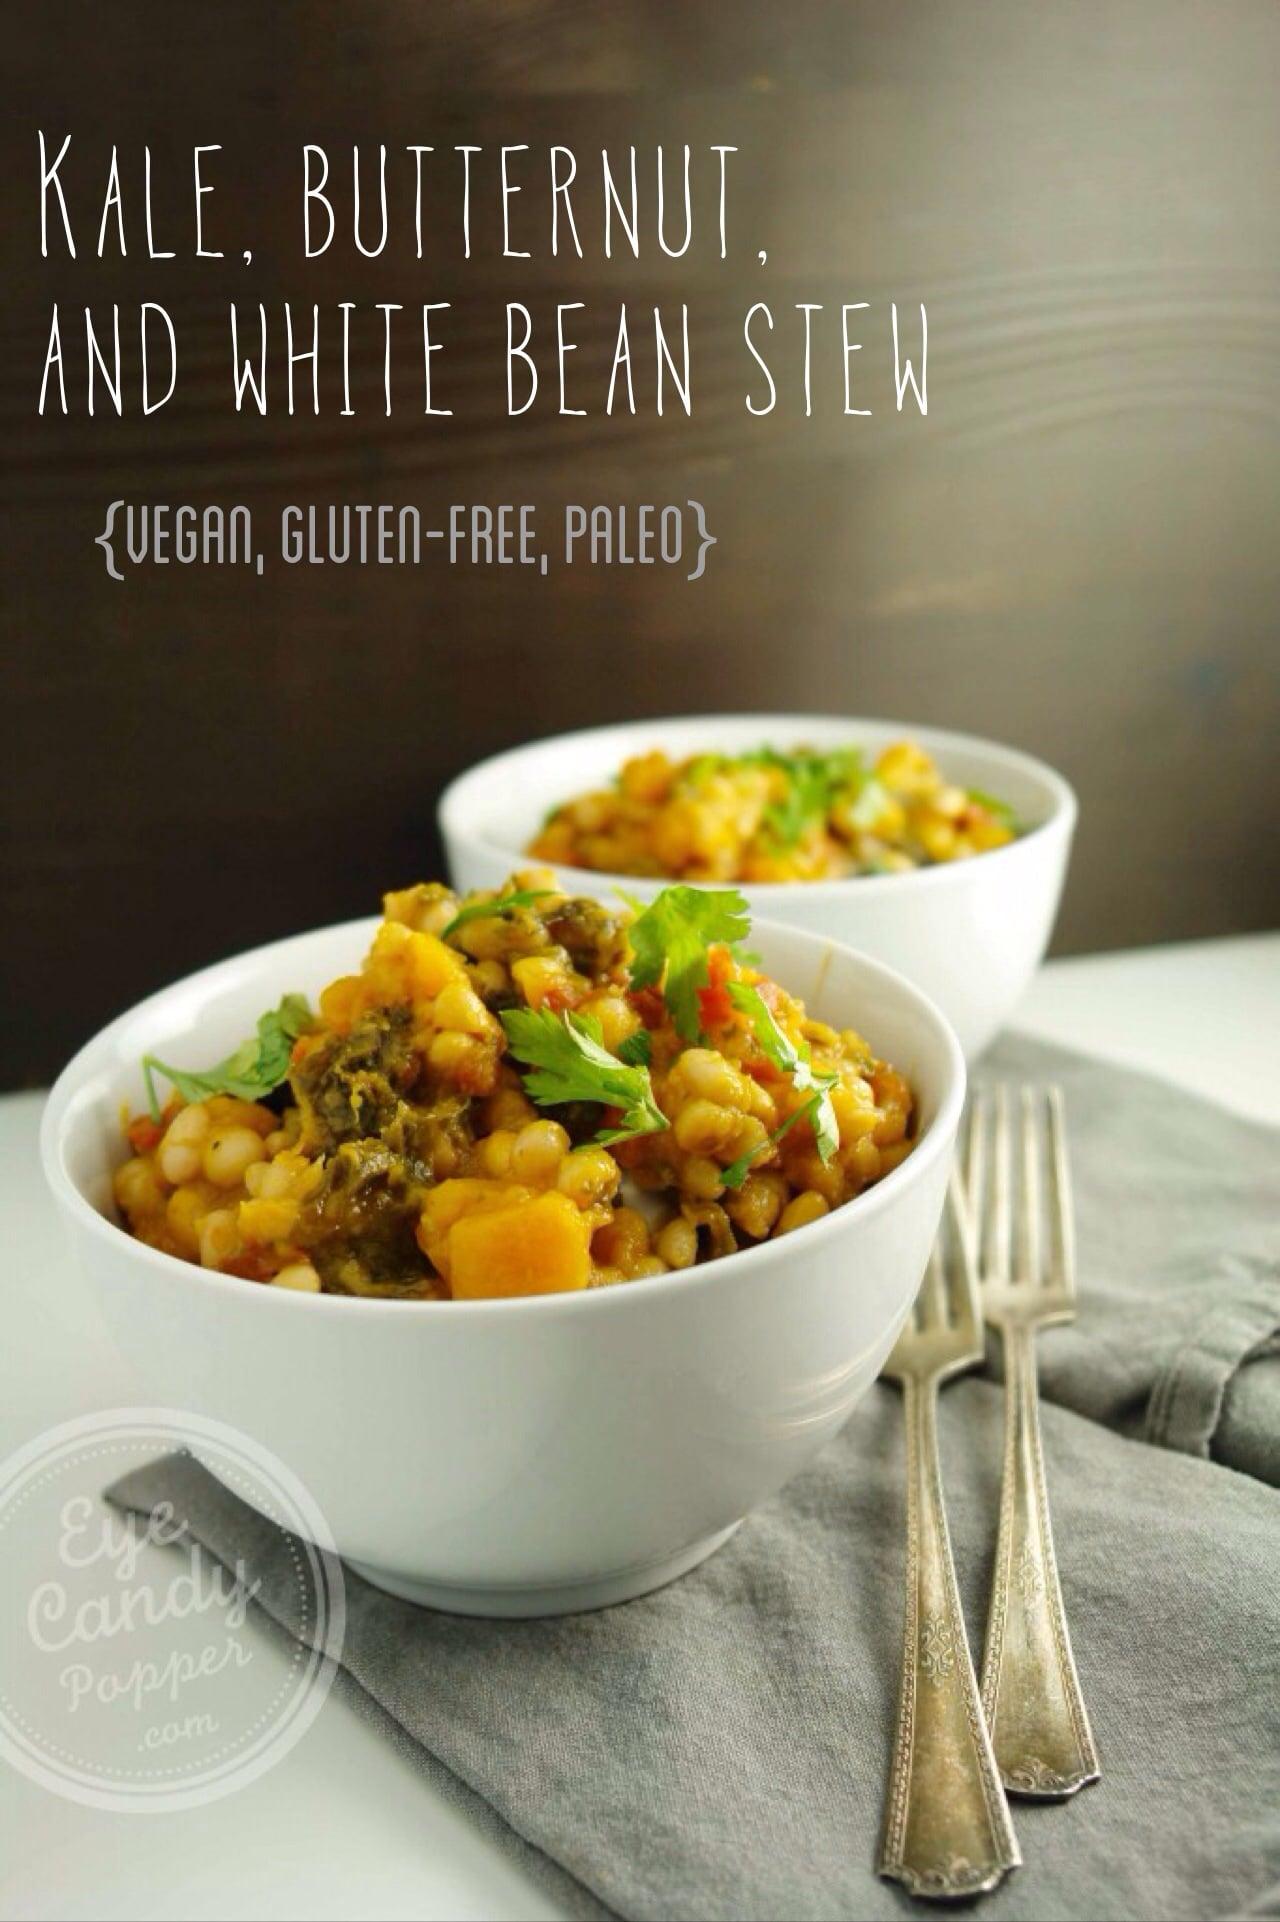 Meatless Monday: Kale, butternut squash and white bean stew (vegan, gluten-free, paleo)